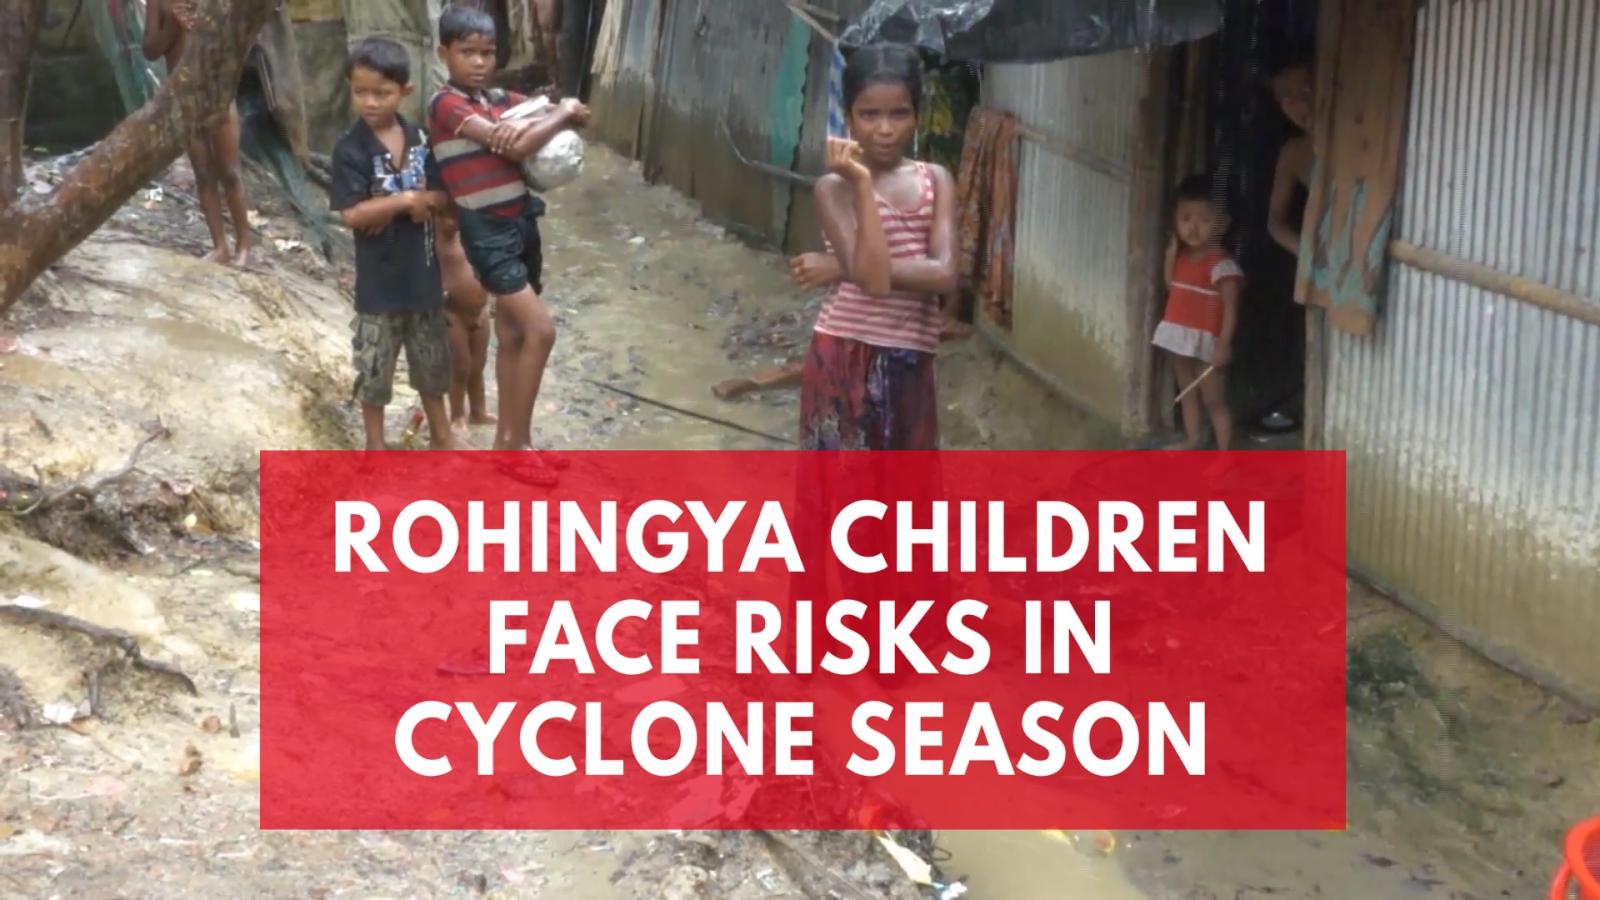 u-n-warns-rohingya-refugees-are-at-risk-as-cyclone-season-approaches